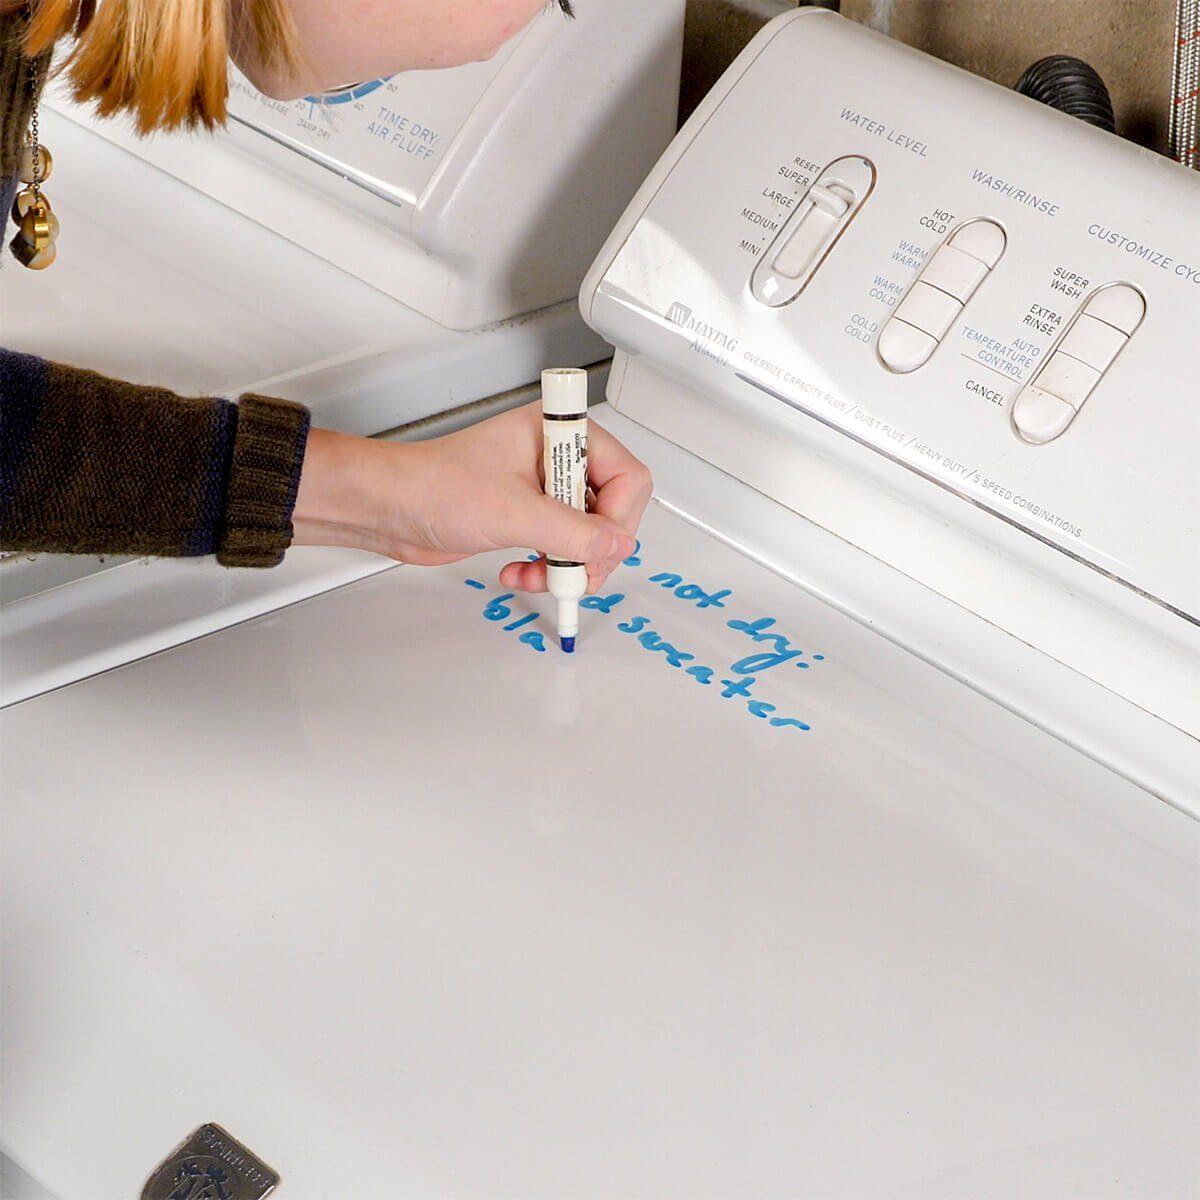 writing notes on washing machine HH